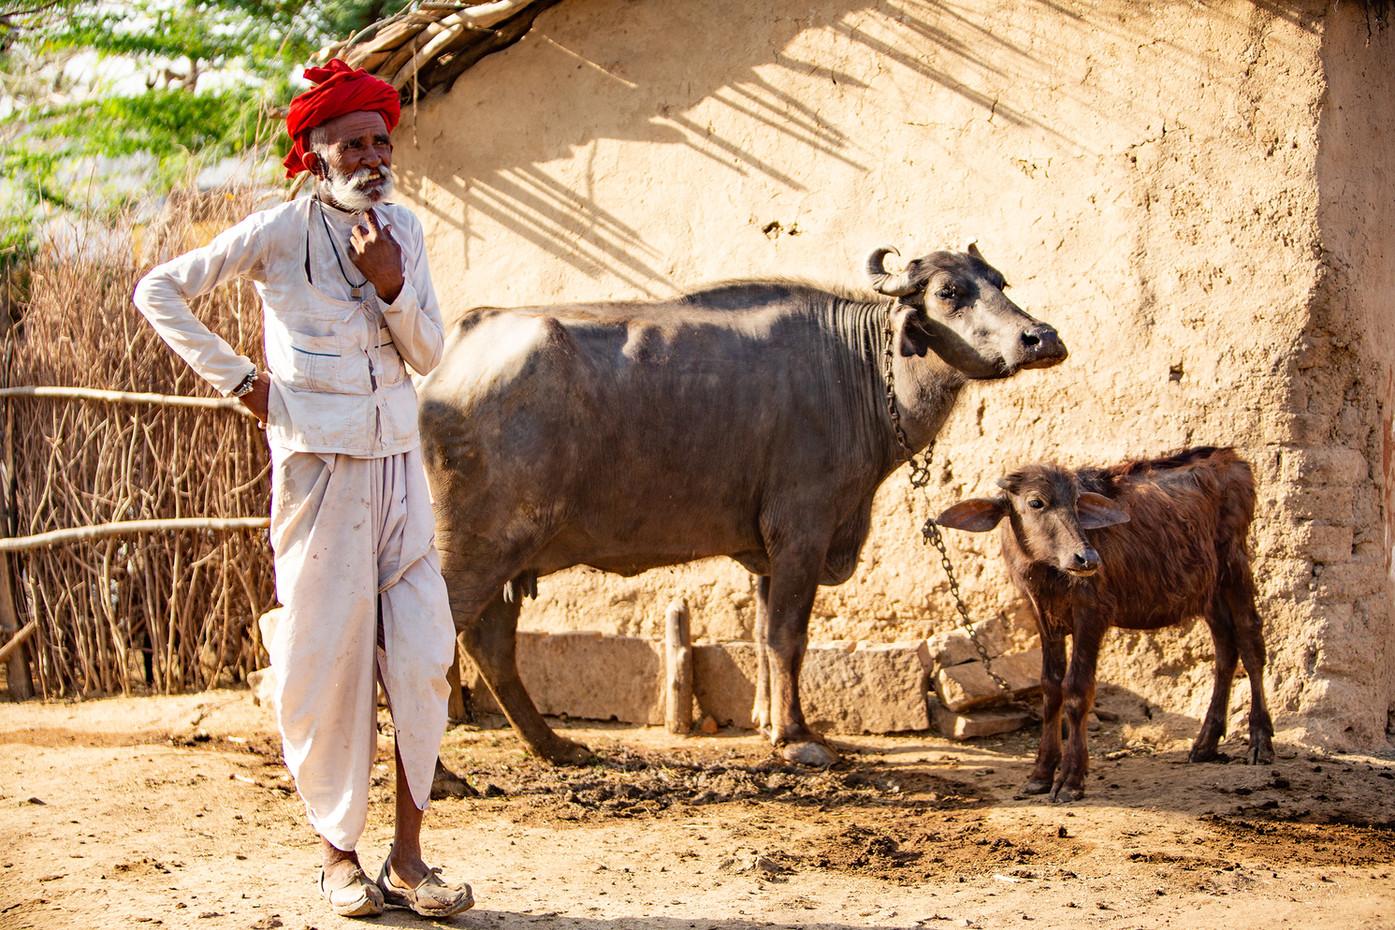 Rabari tribesman & water buffalo near Pali, India